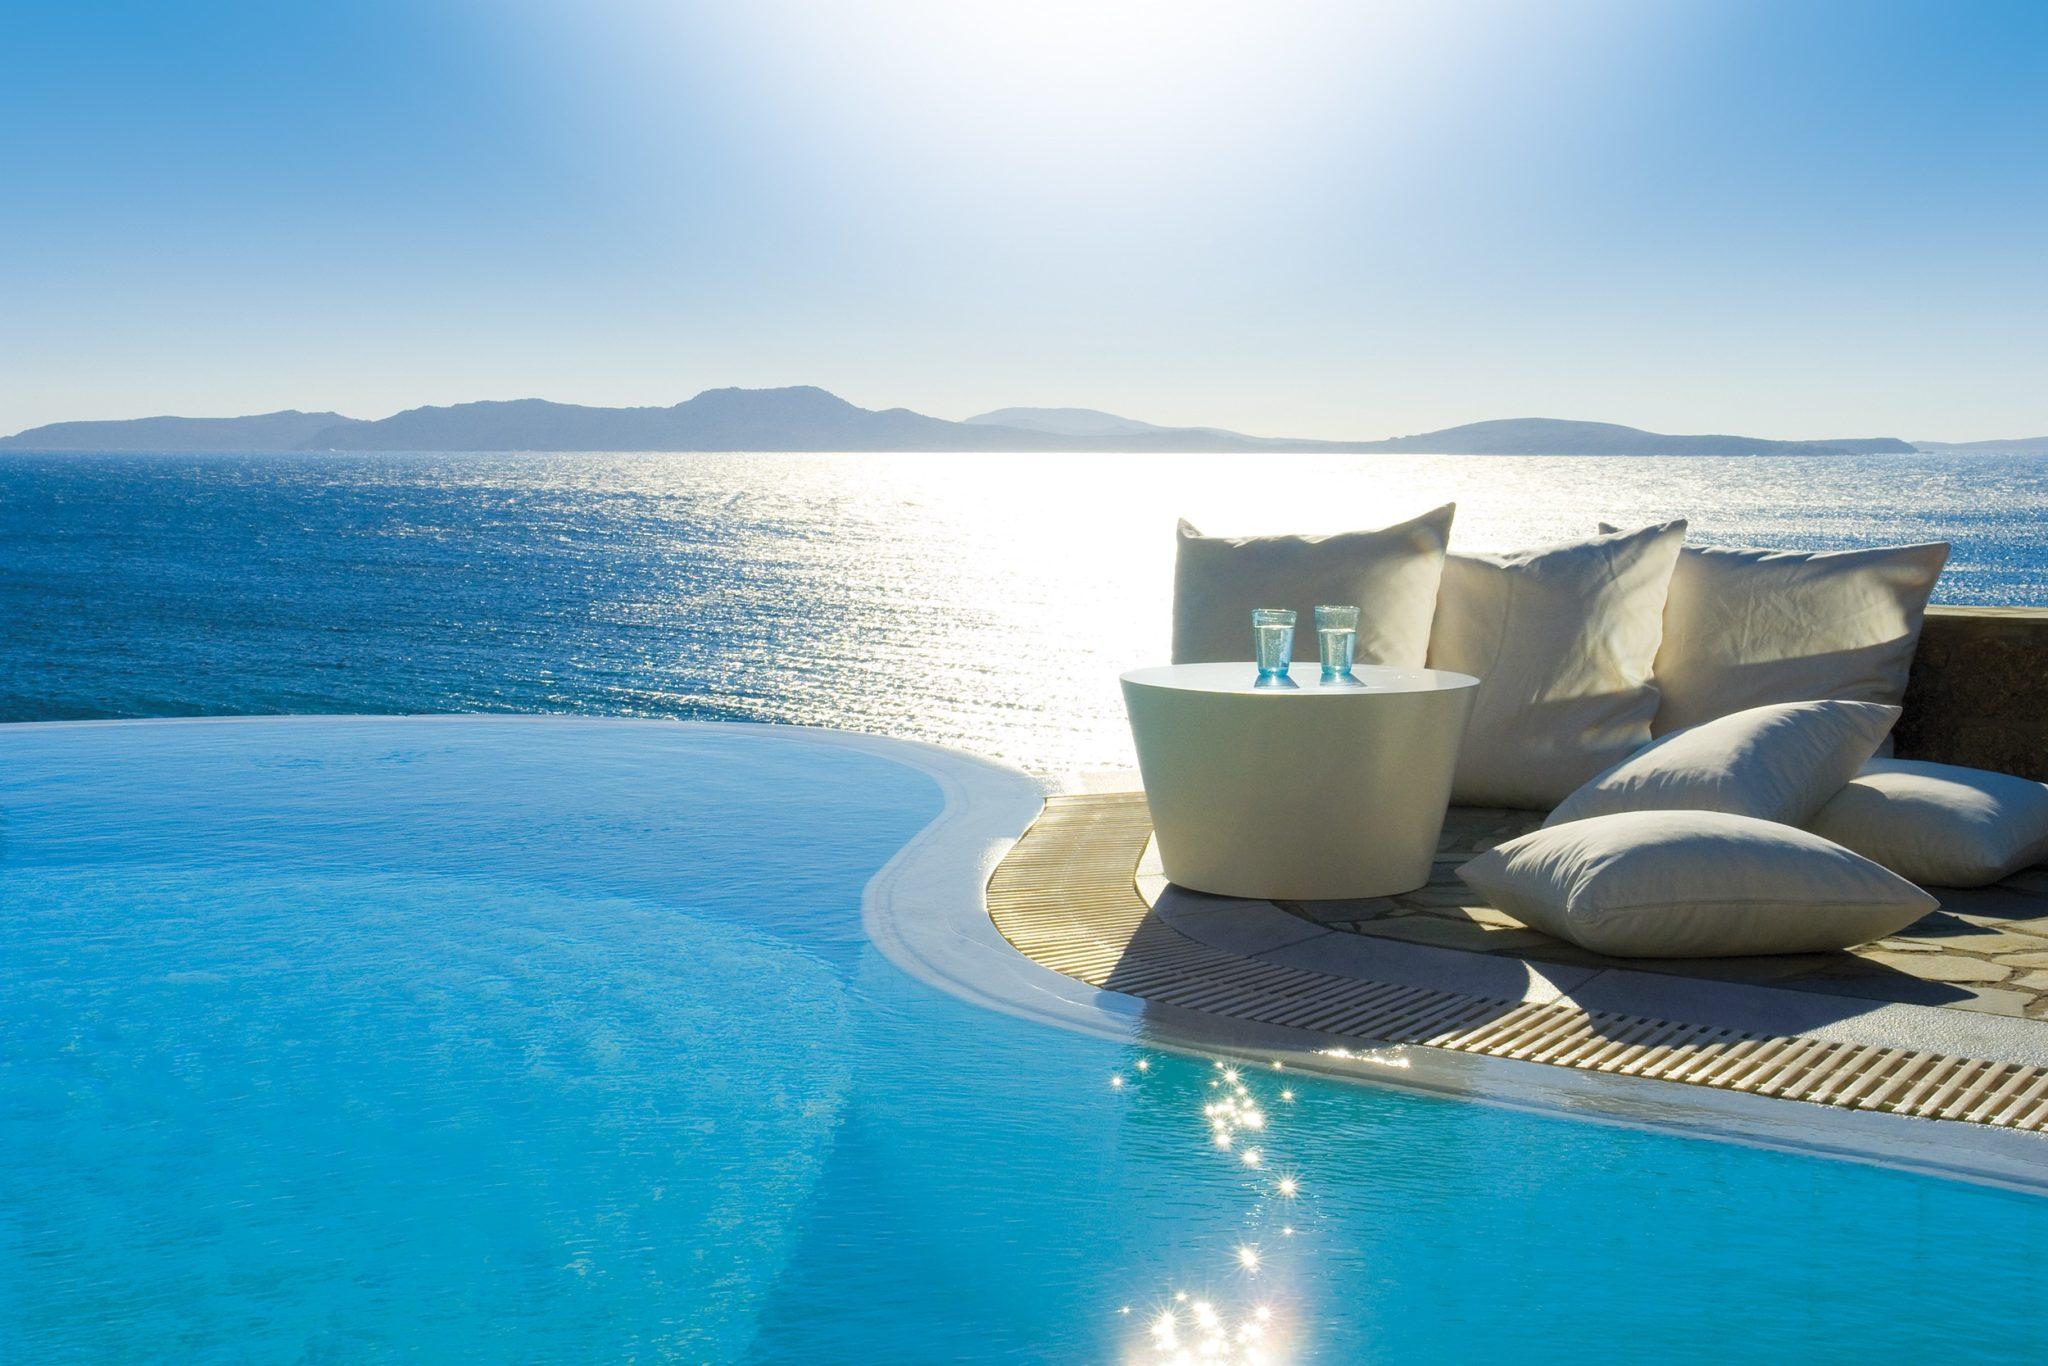 Mykonos grand hotel and resort greece infinity pools - Small infinity pool ...